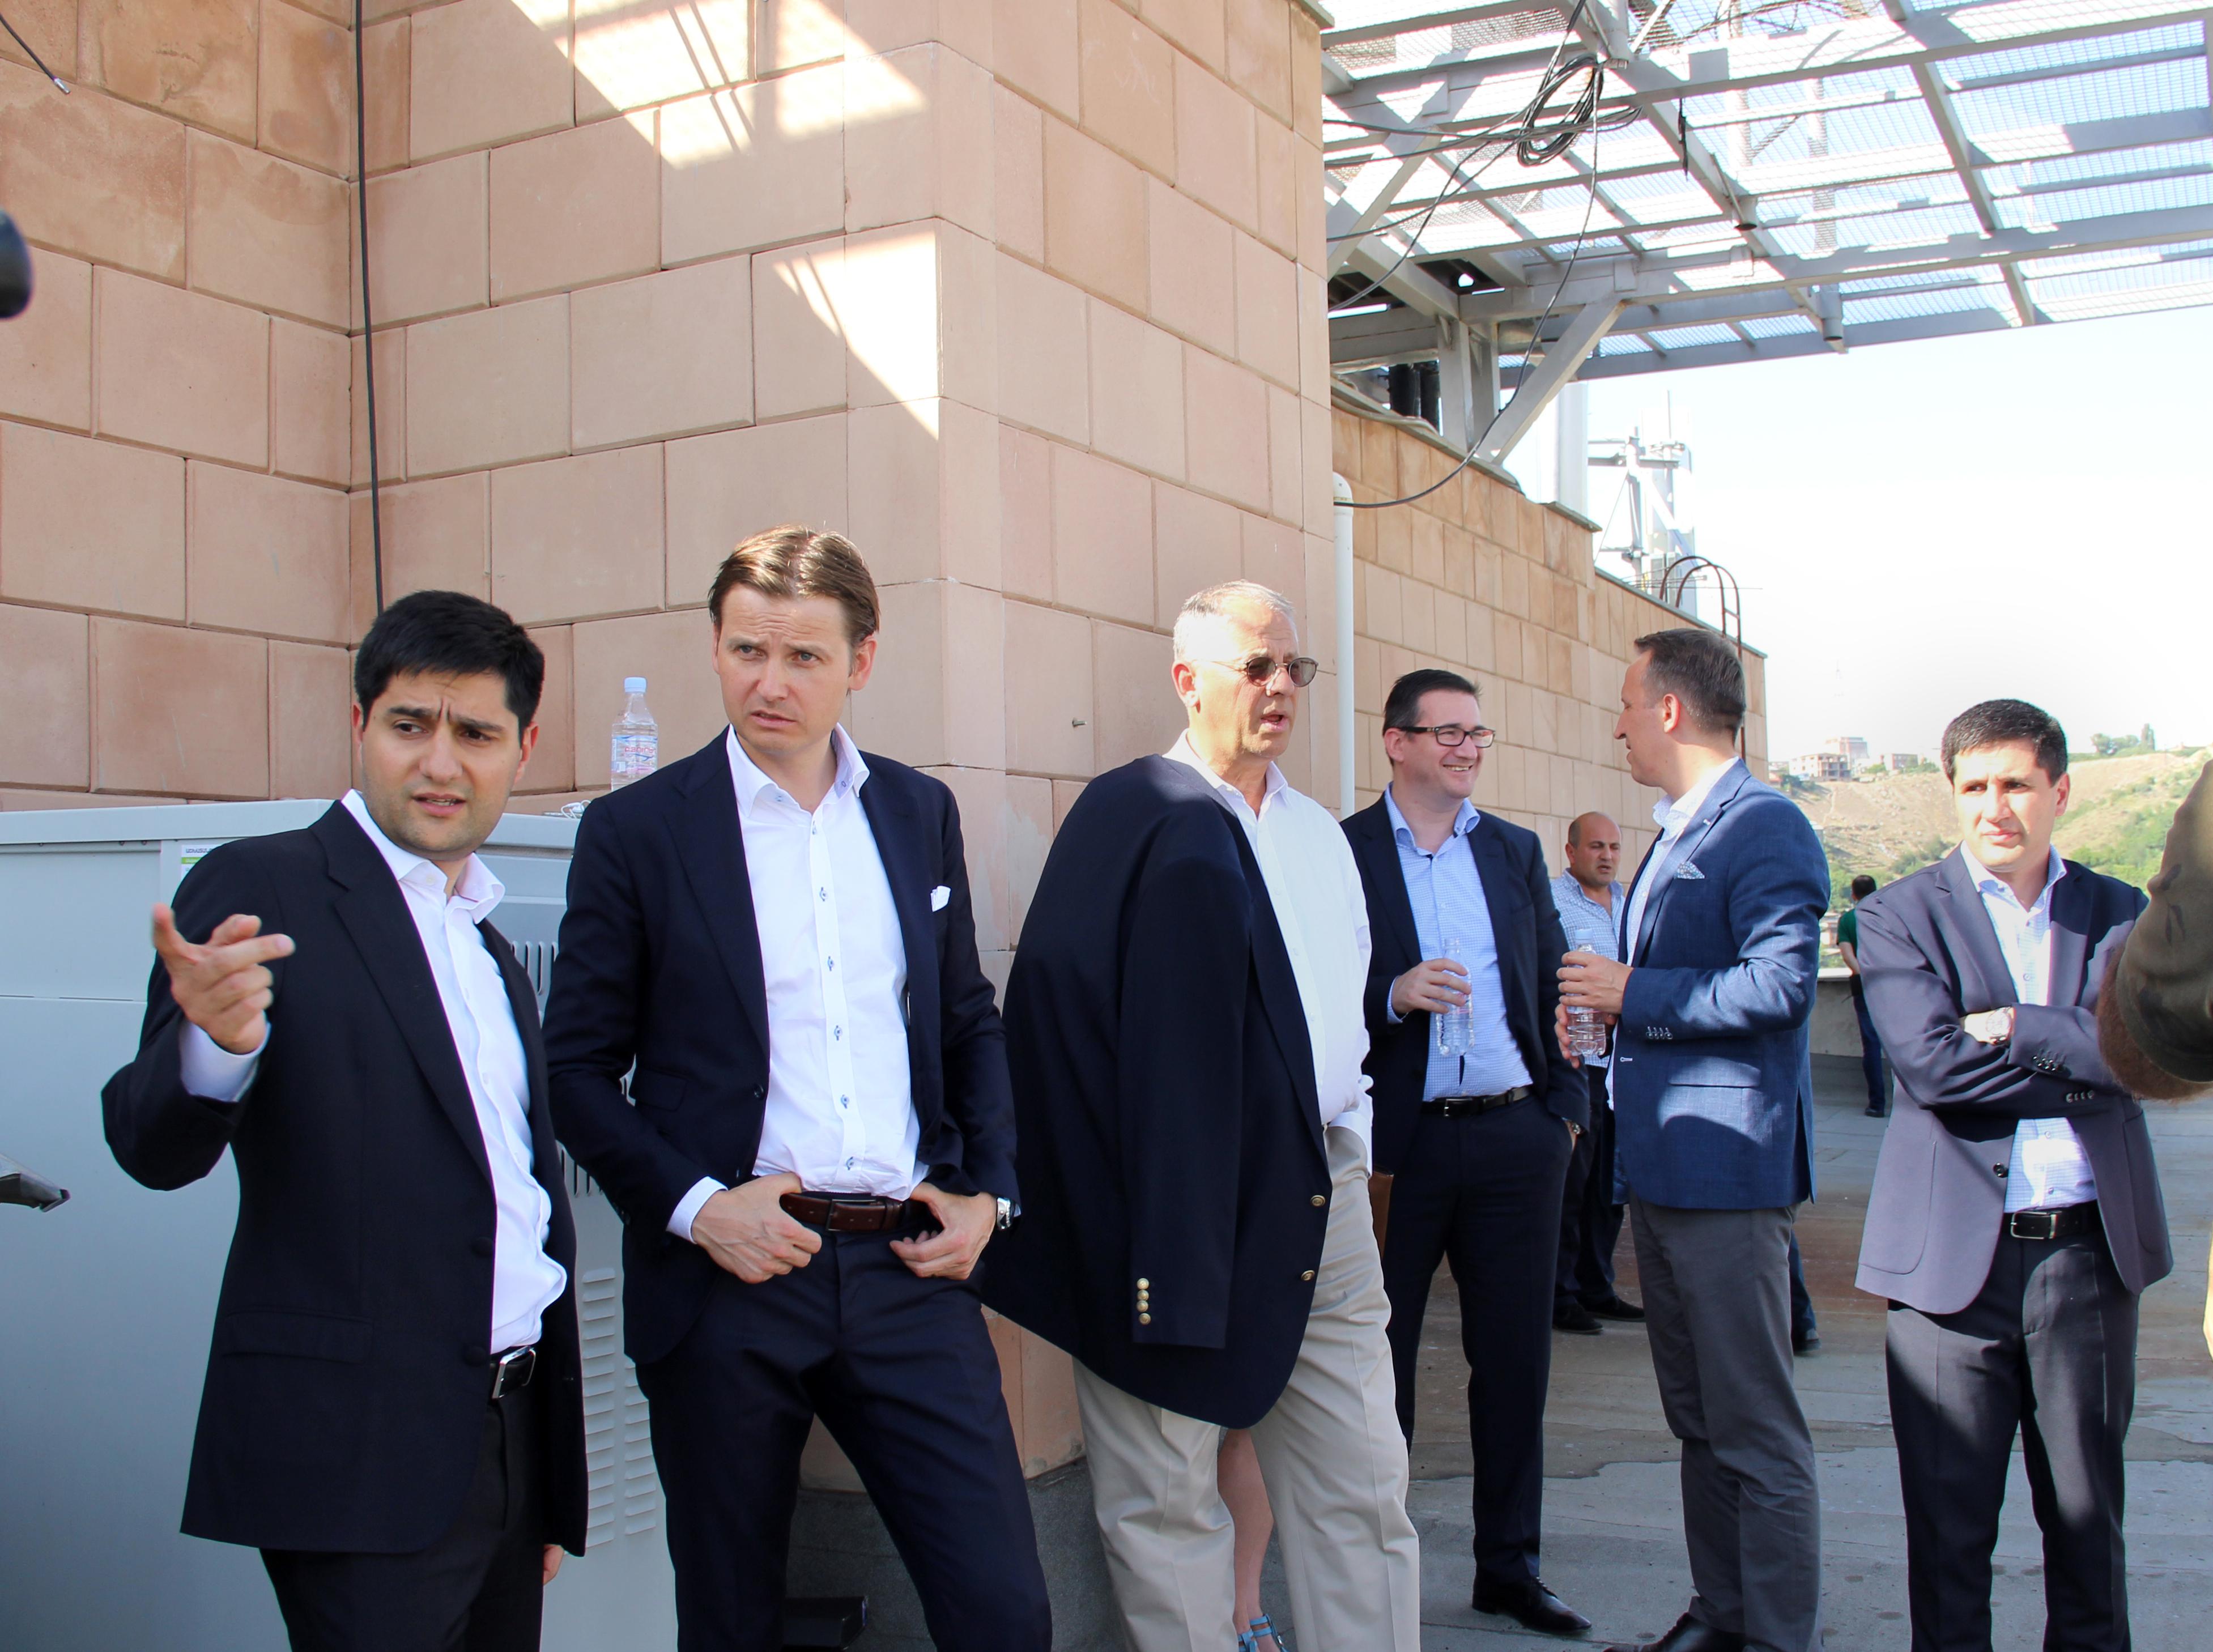 Ucom. Ericsson ընկերության 4G+ տեխնոլոգիայի ներդրման աշխատանքները մոտենում են ավարտին